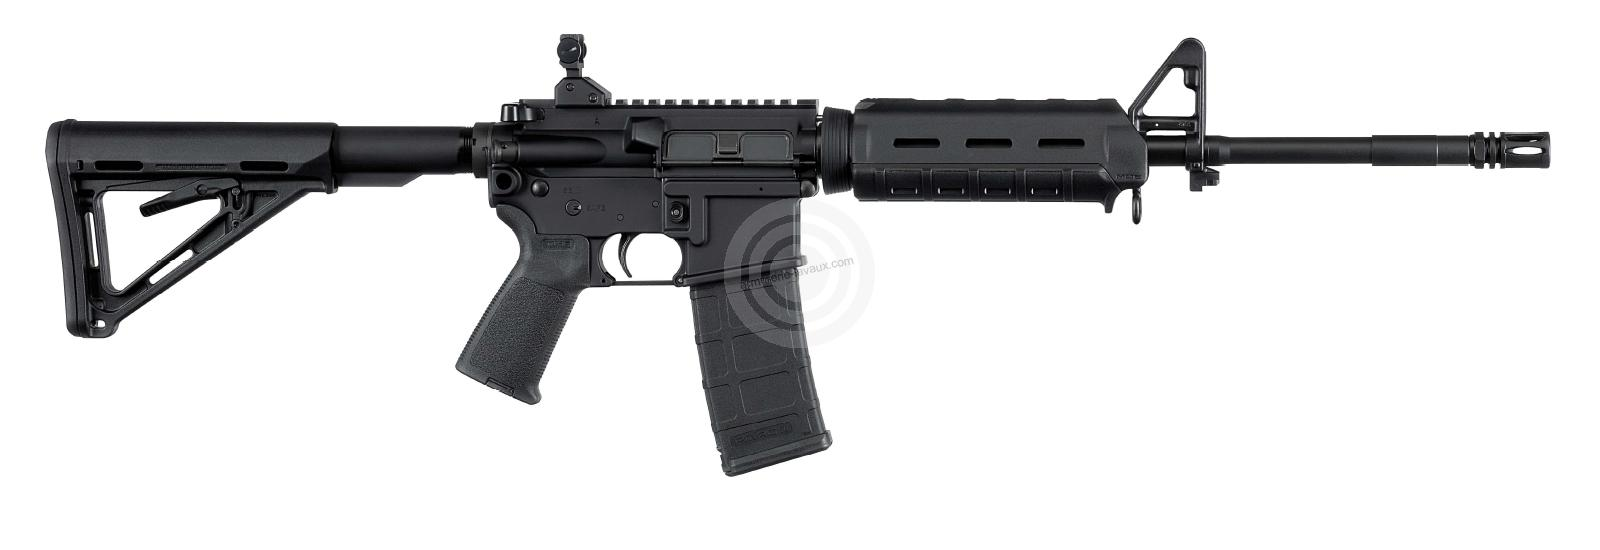 SIG SAUER M400 Enhanced Magpul cal.223 Rem